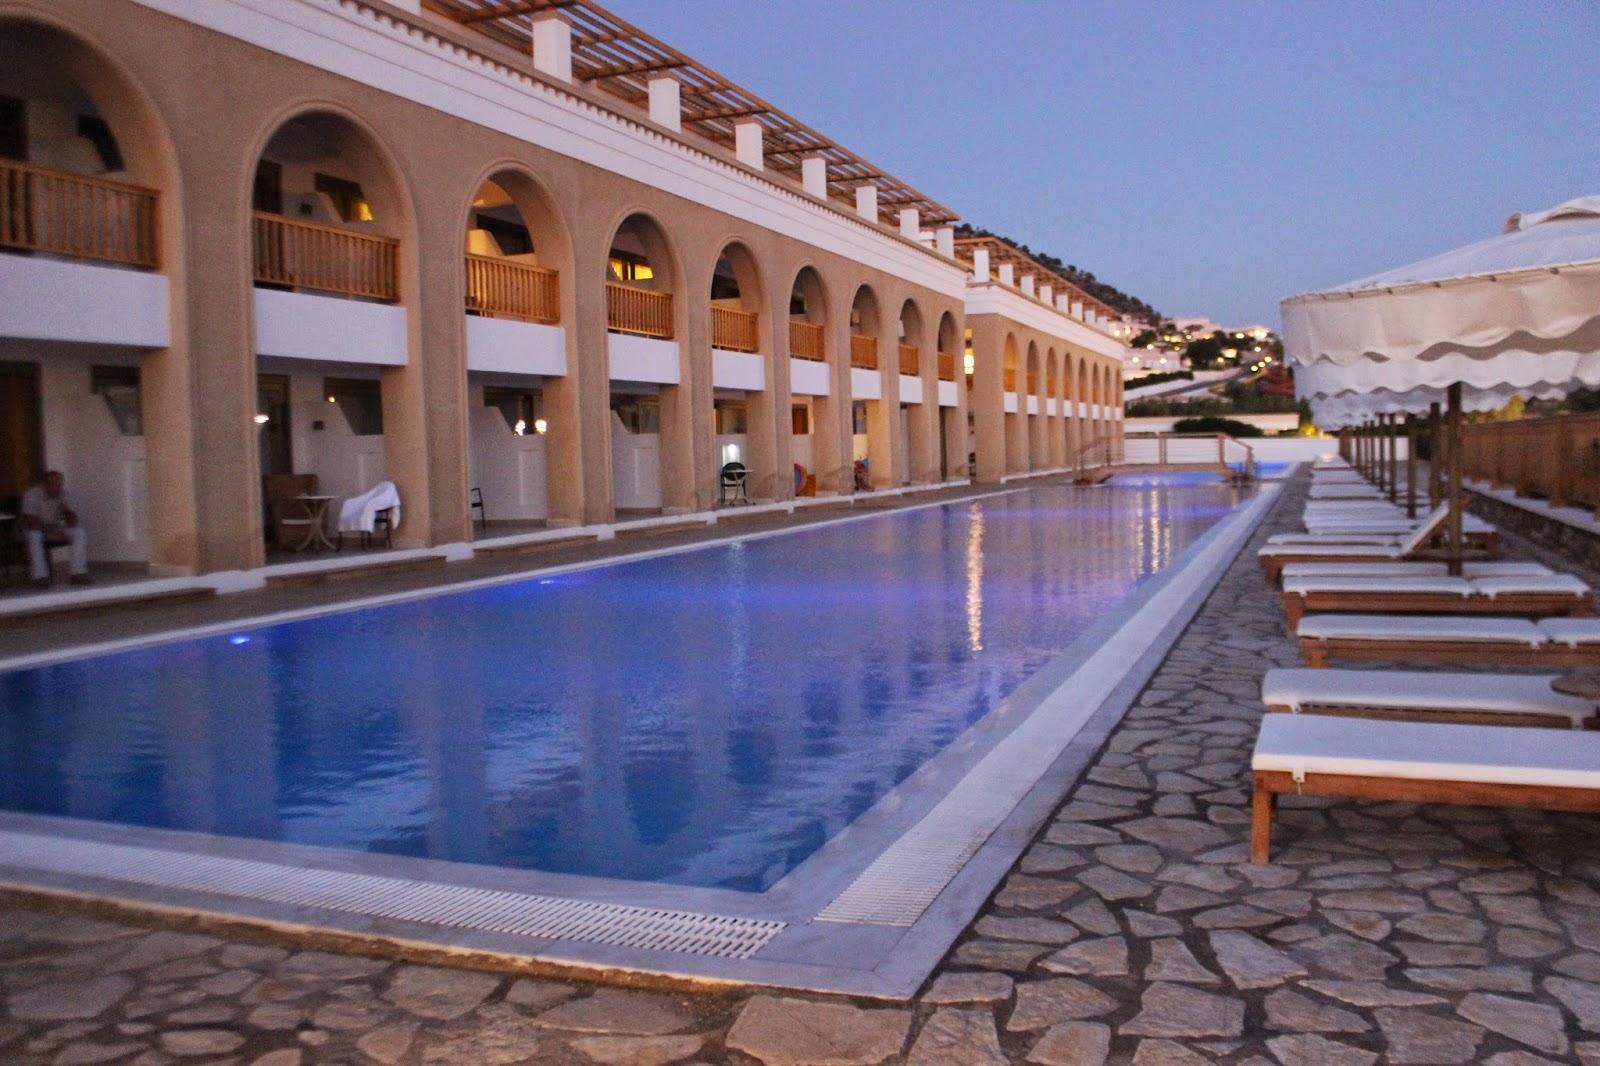 Mitsis Blue Domes Hotel, Karadmena, Kos, Greece